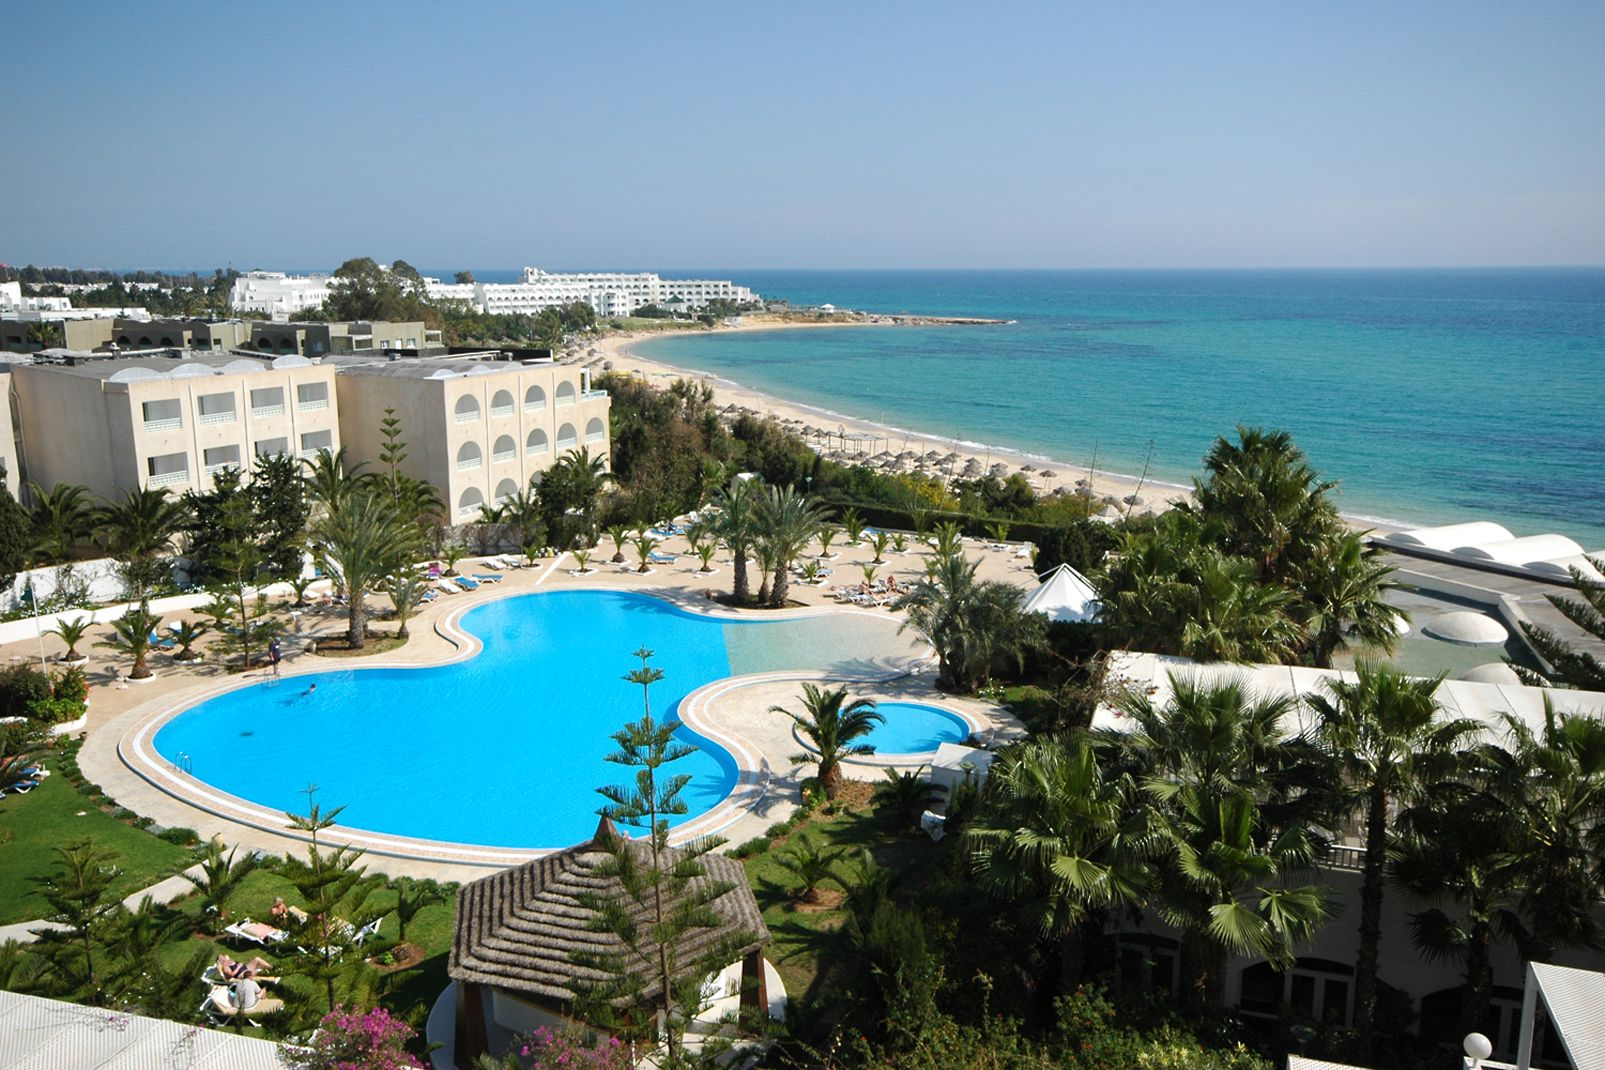 Hôtel Sentido Aziza Beach - Adult only 4* - 1